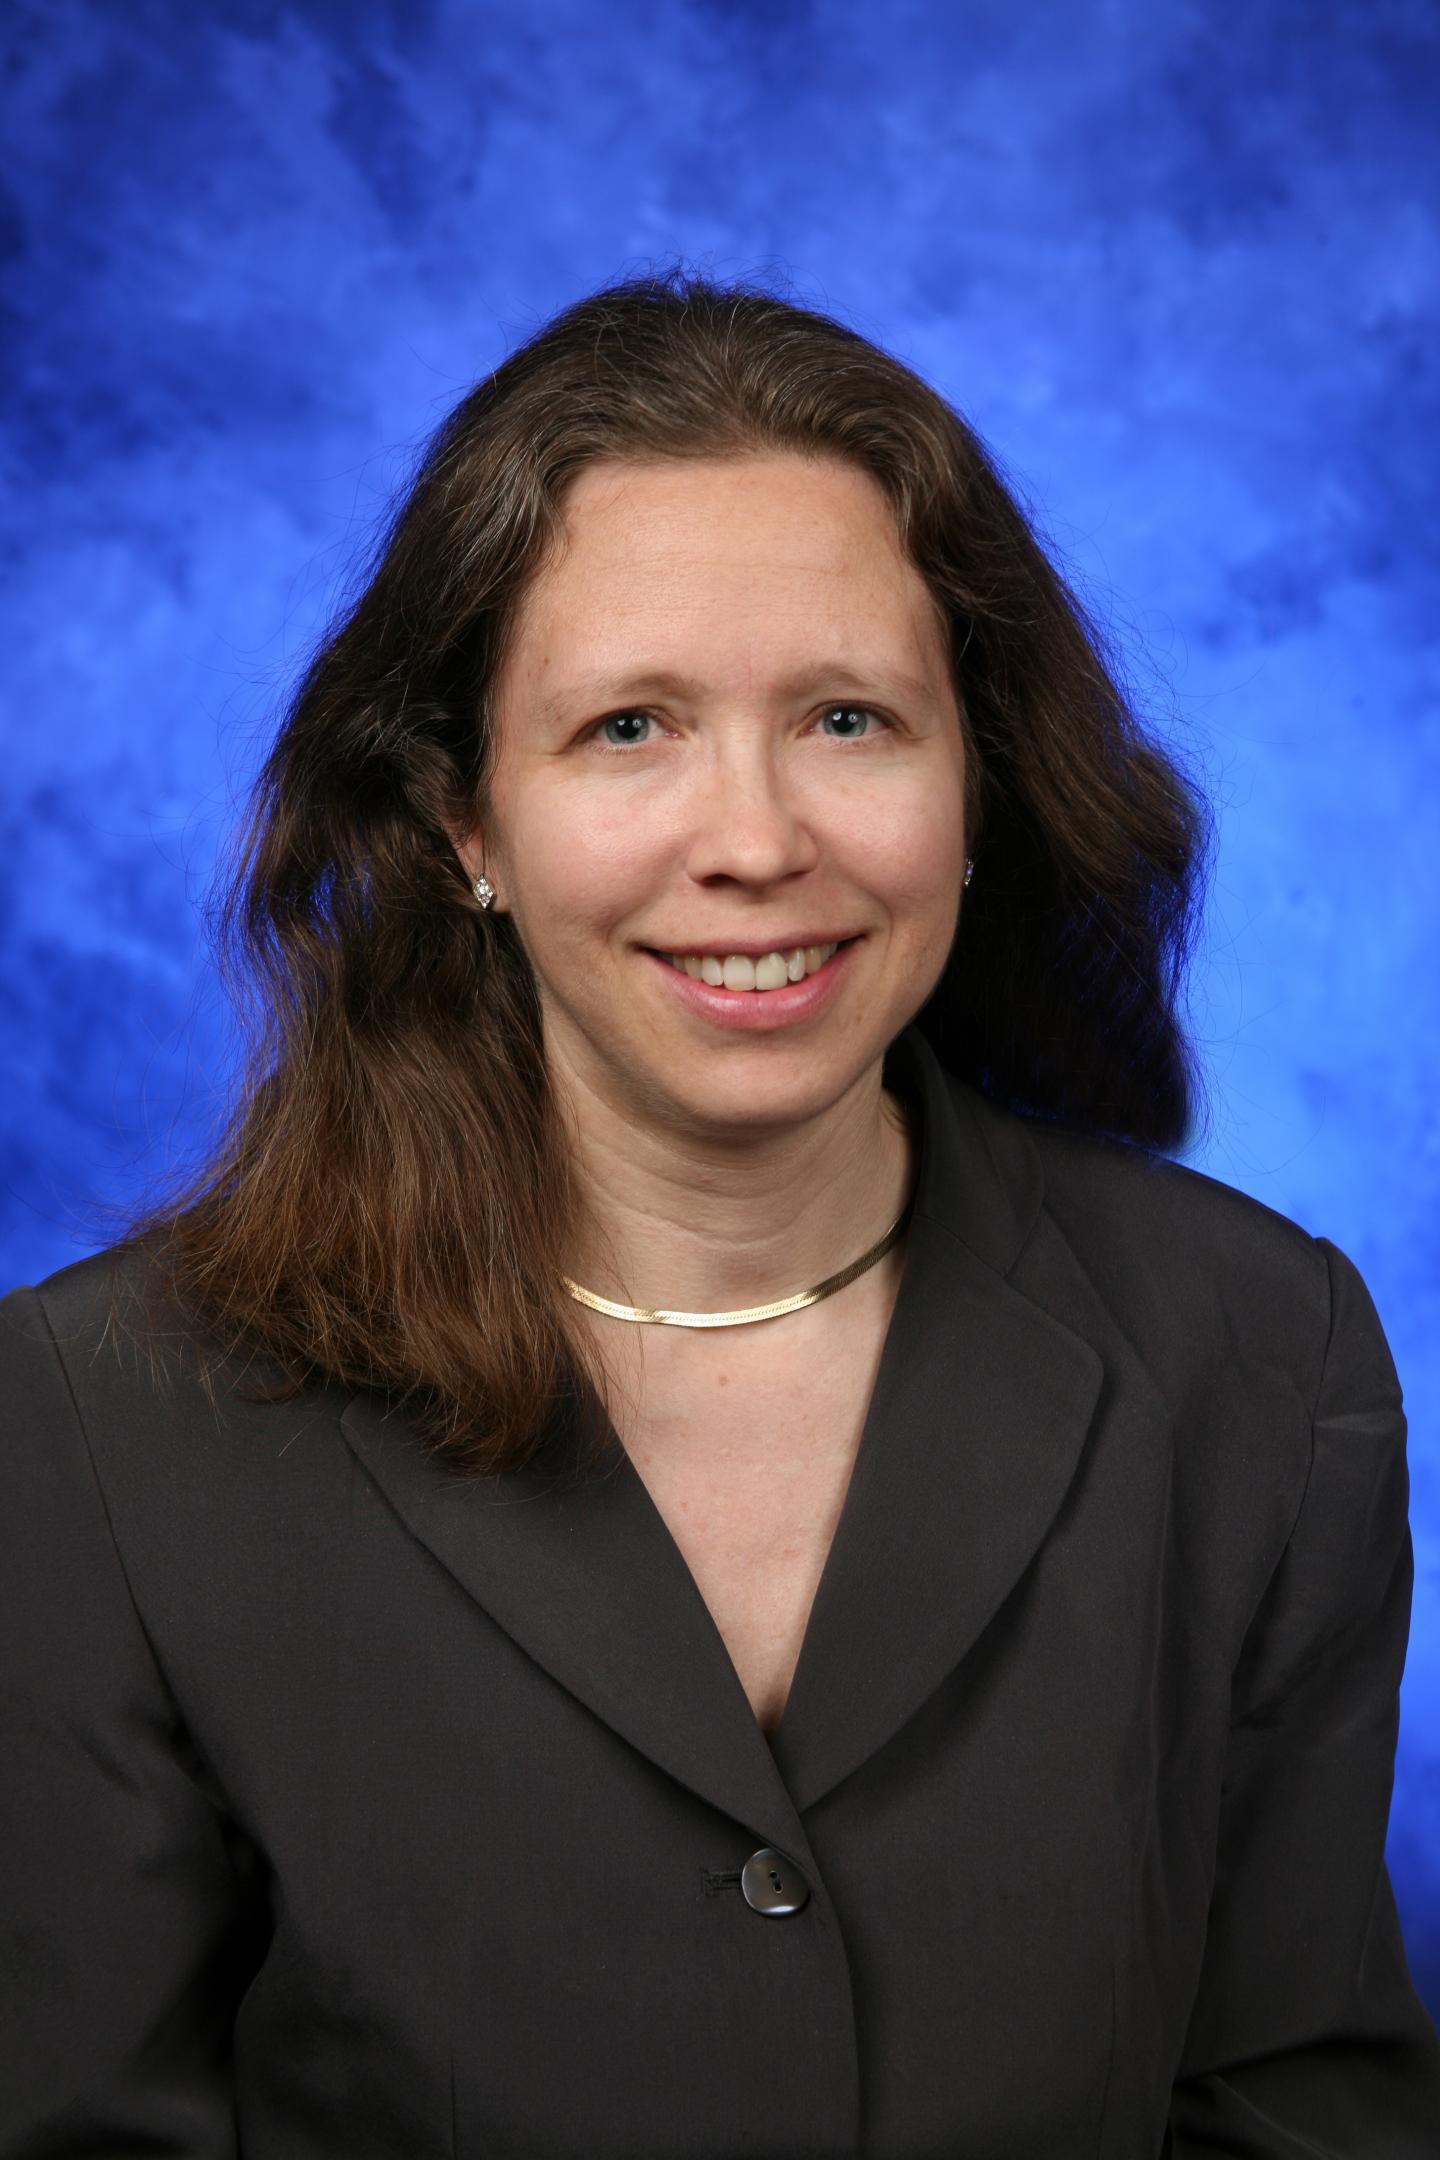 Ingrid U. Scott, Chair of the Study